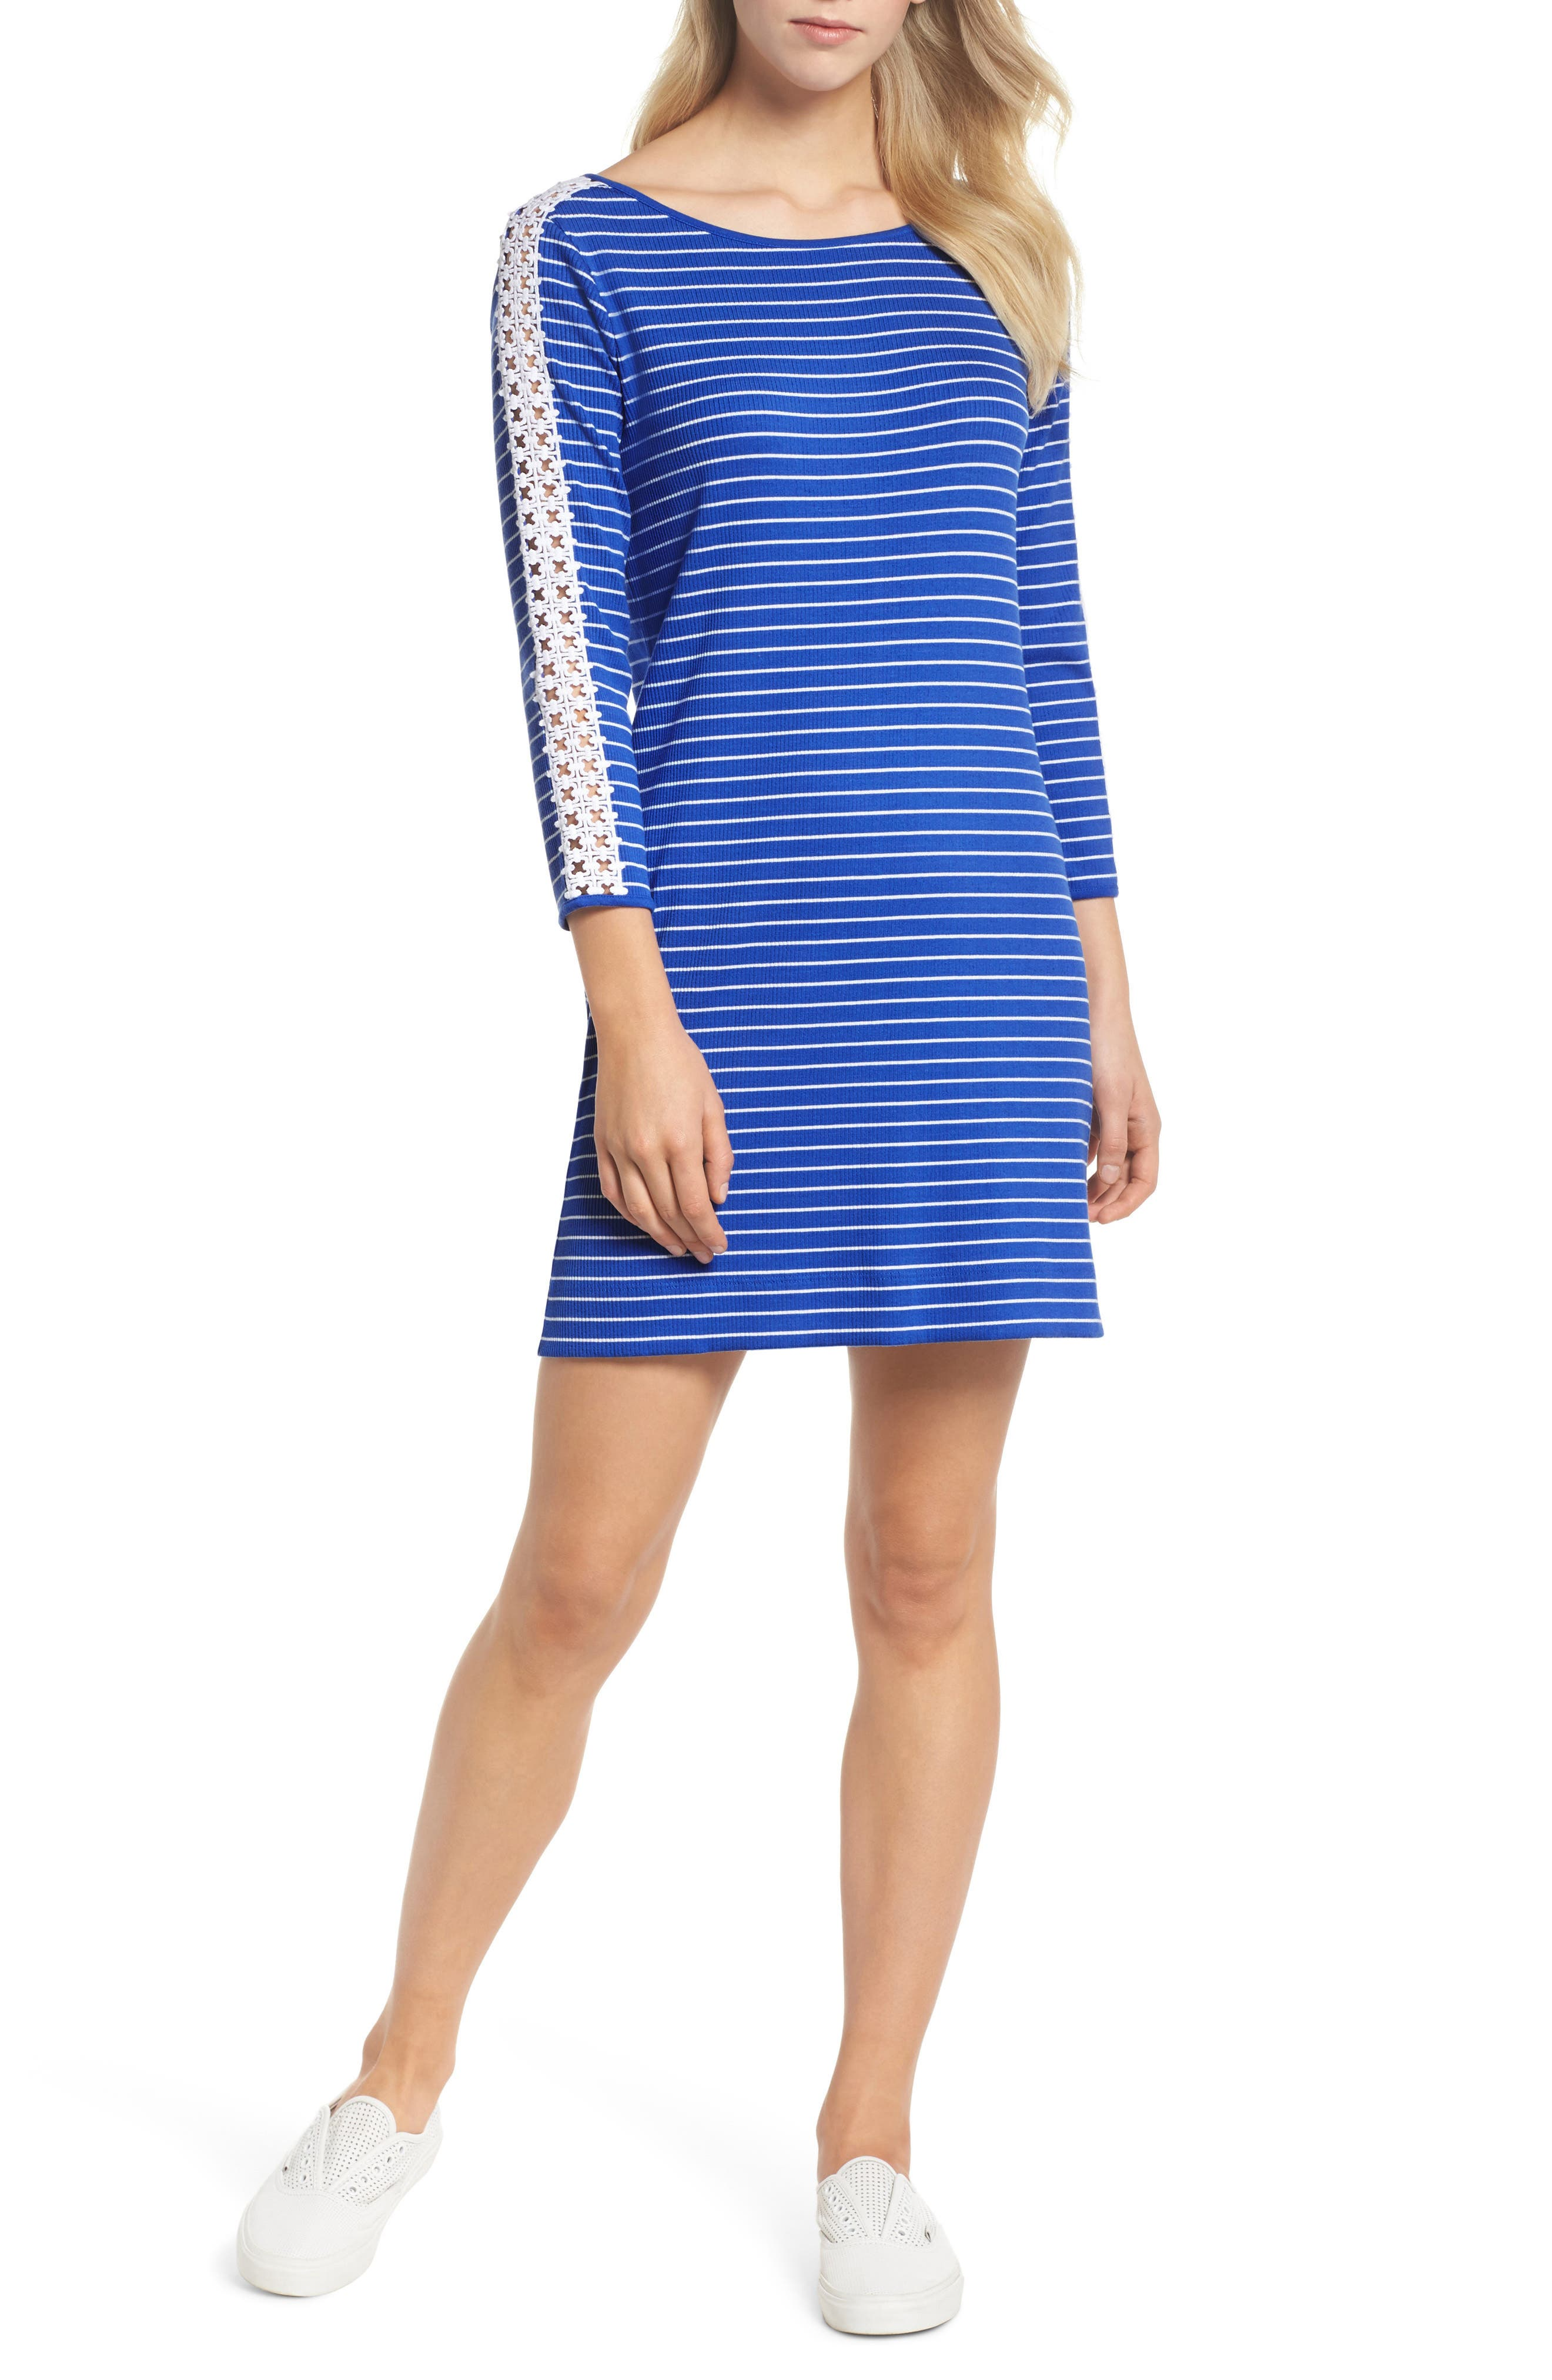 Marlowe Shift Dress,                         Main,                         color, Beckon Blue Breeze Stripe